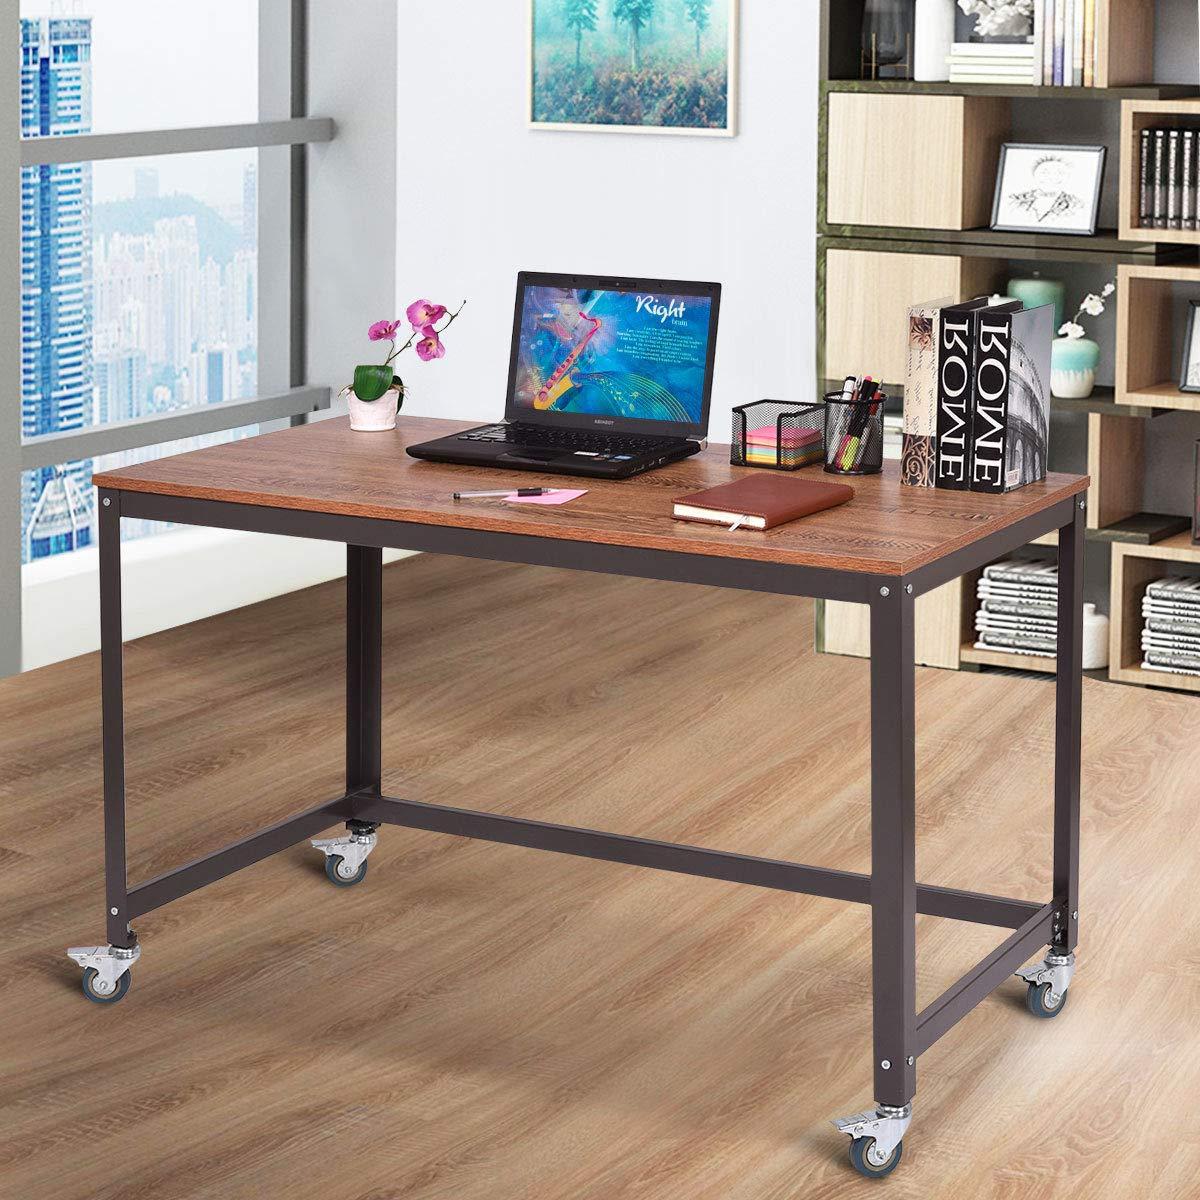 desk on wheels amazon com rh amazon com desk with wheels nz desk with wheels computer